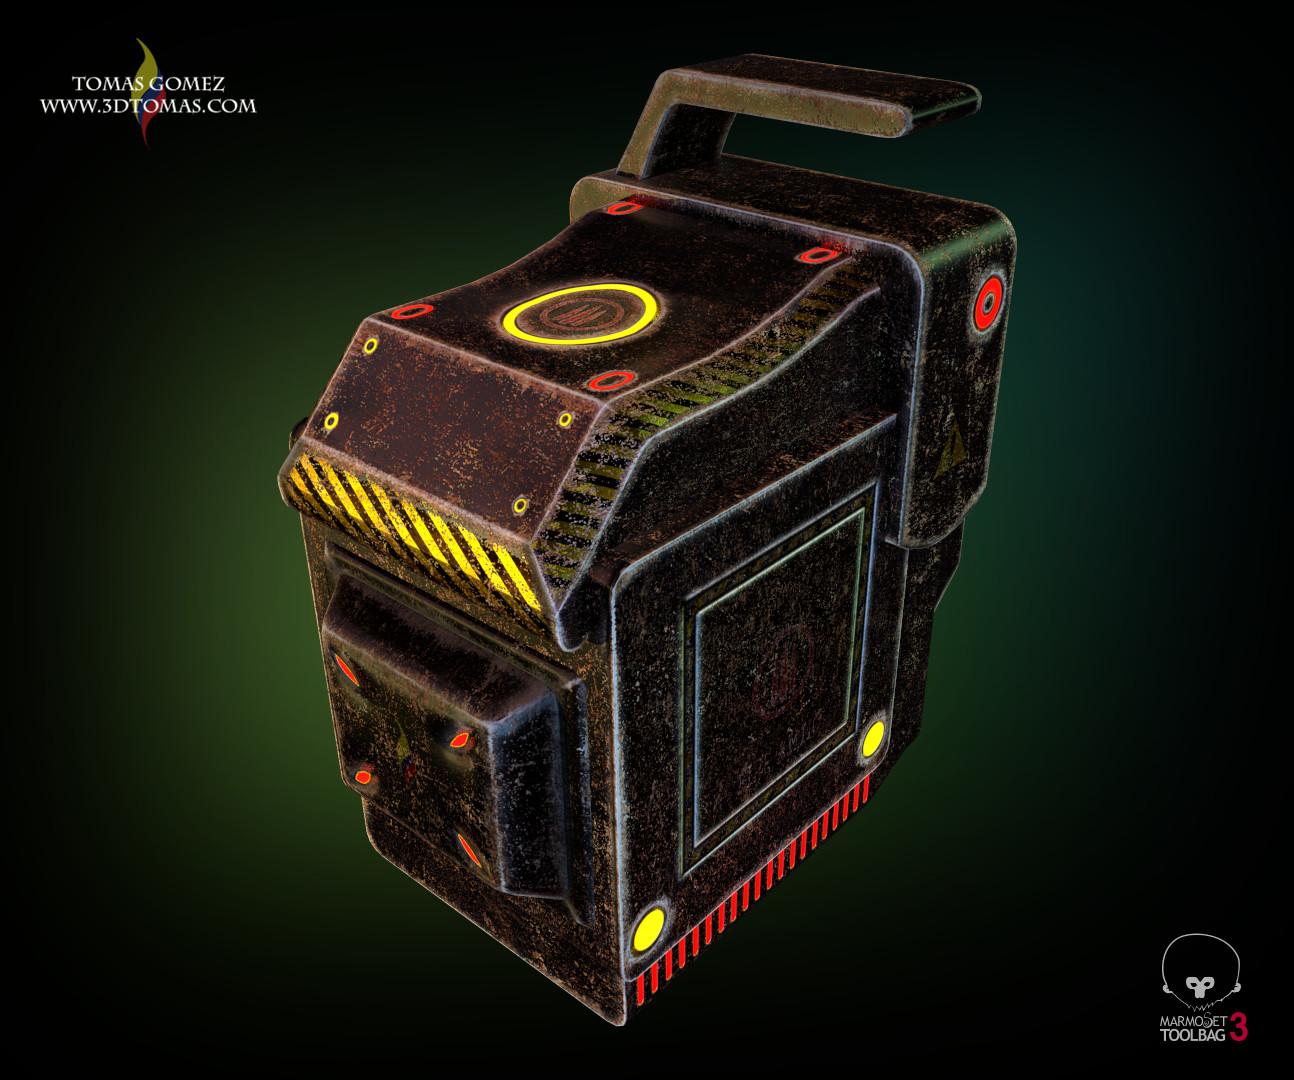 Tomas gomez crate1